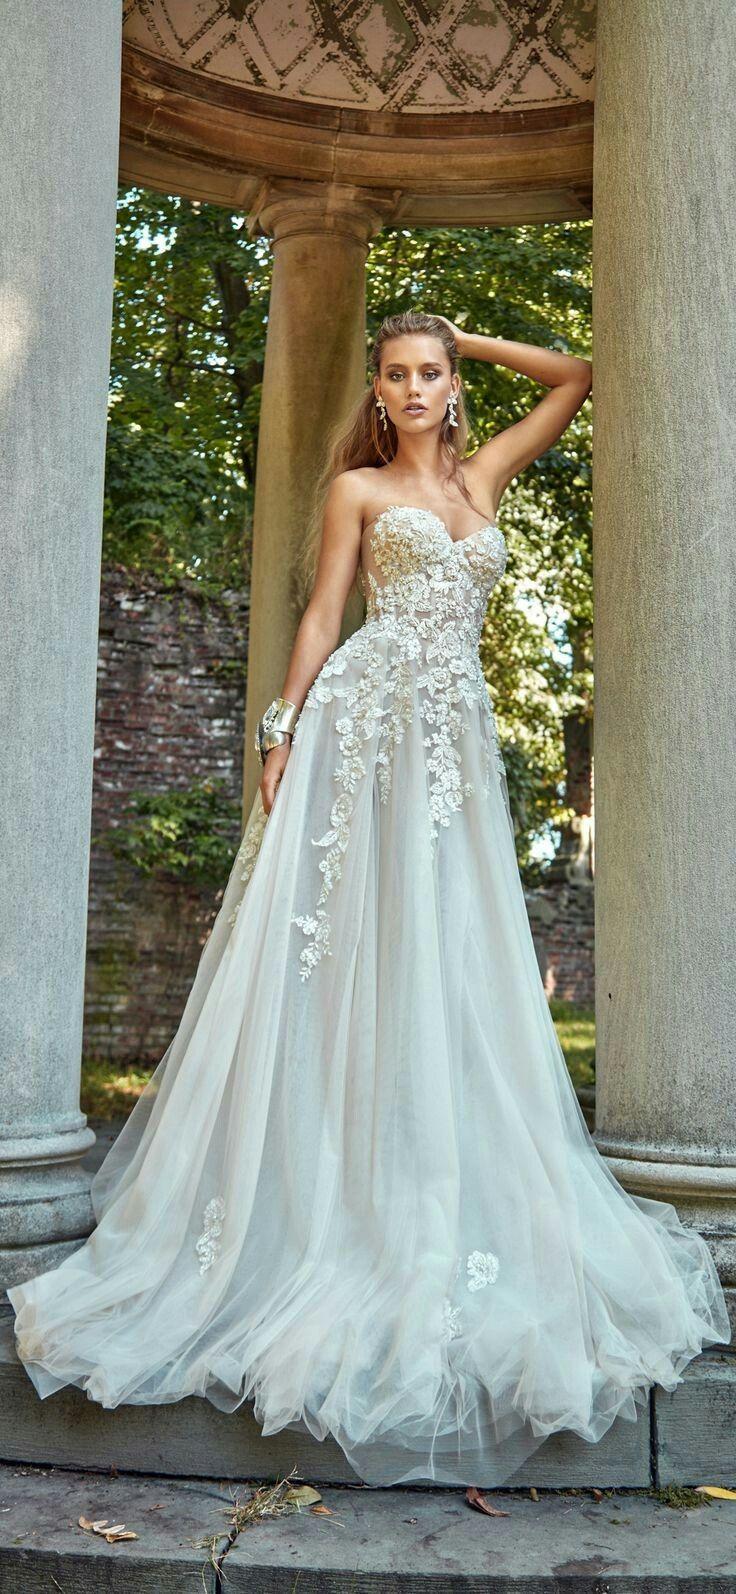 109 best wedding dress images on Pinterest | Formal prom dresses ...